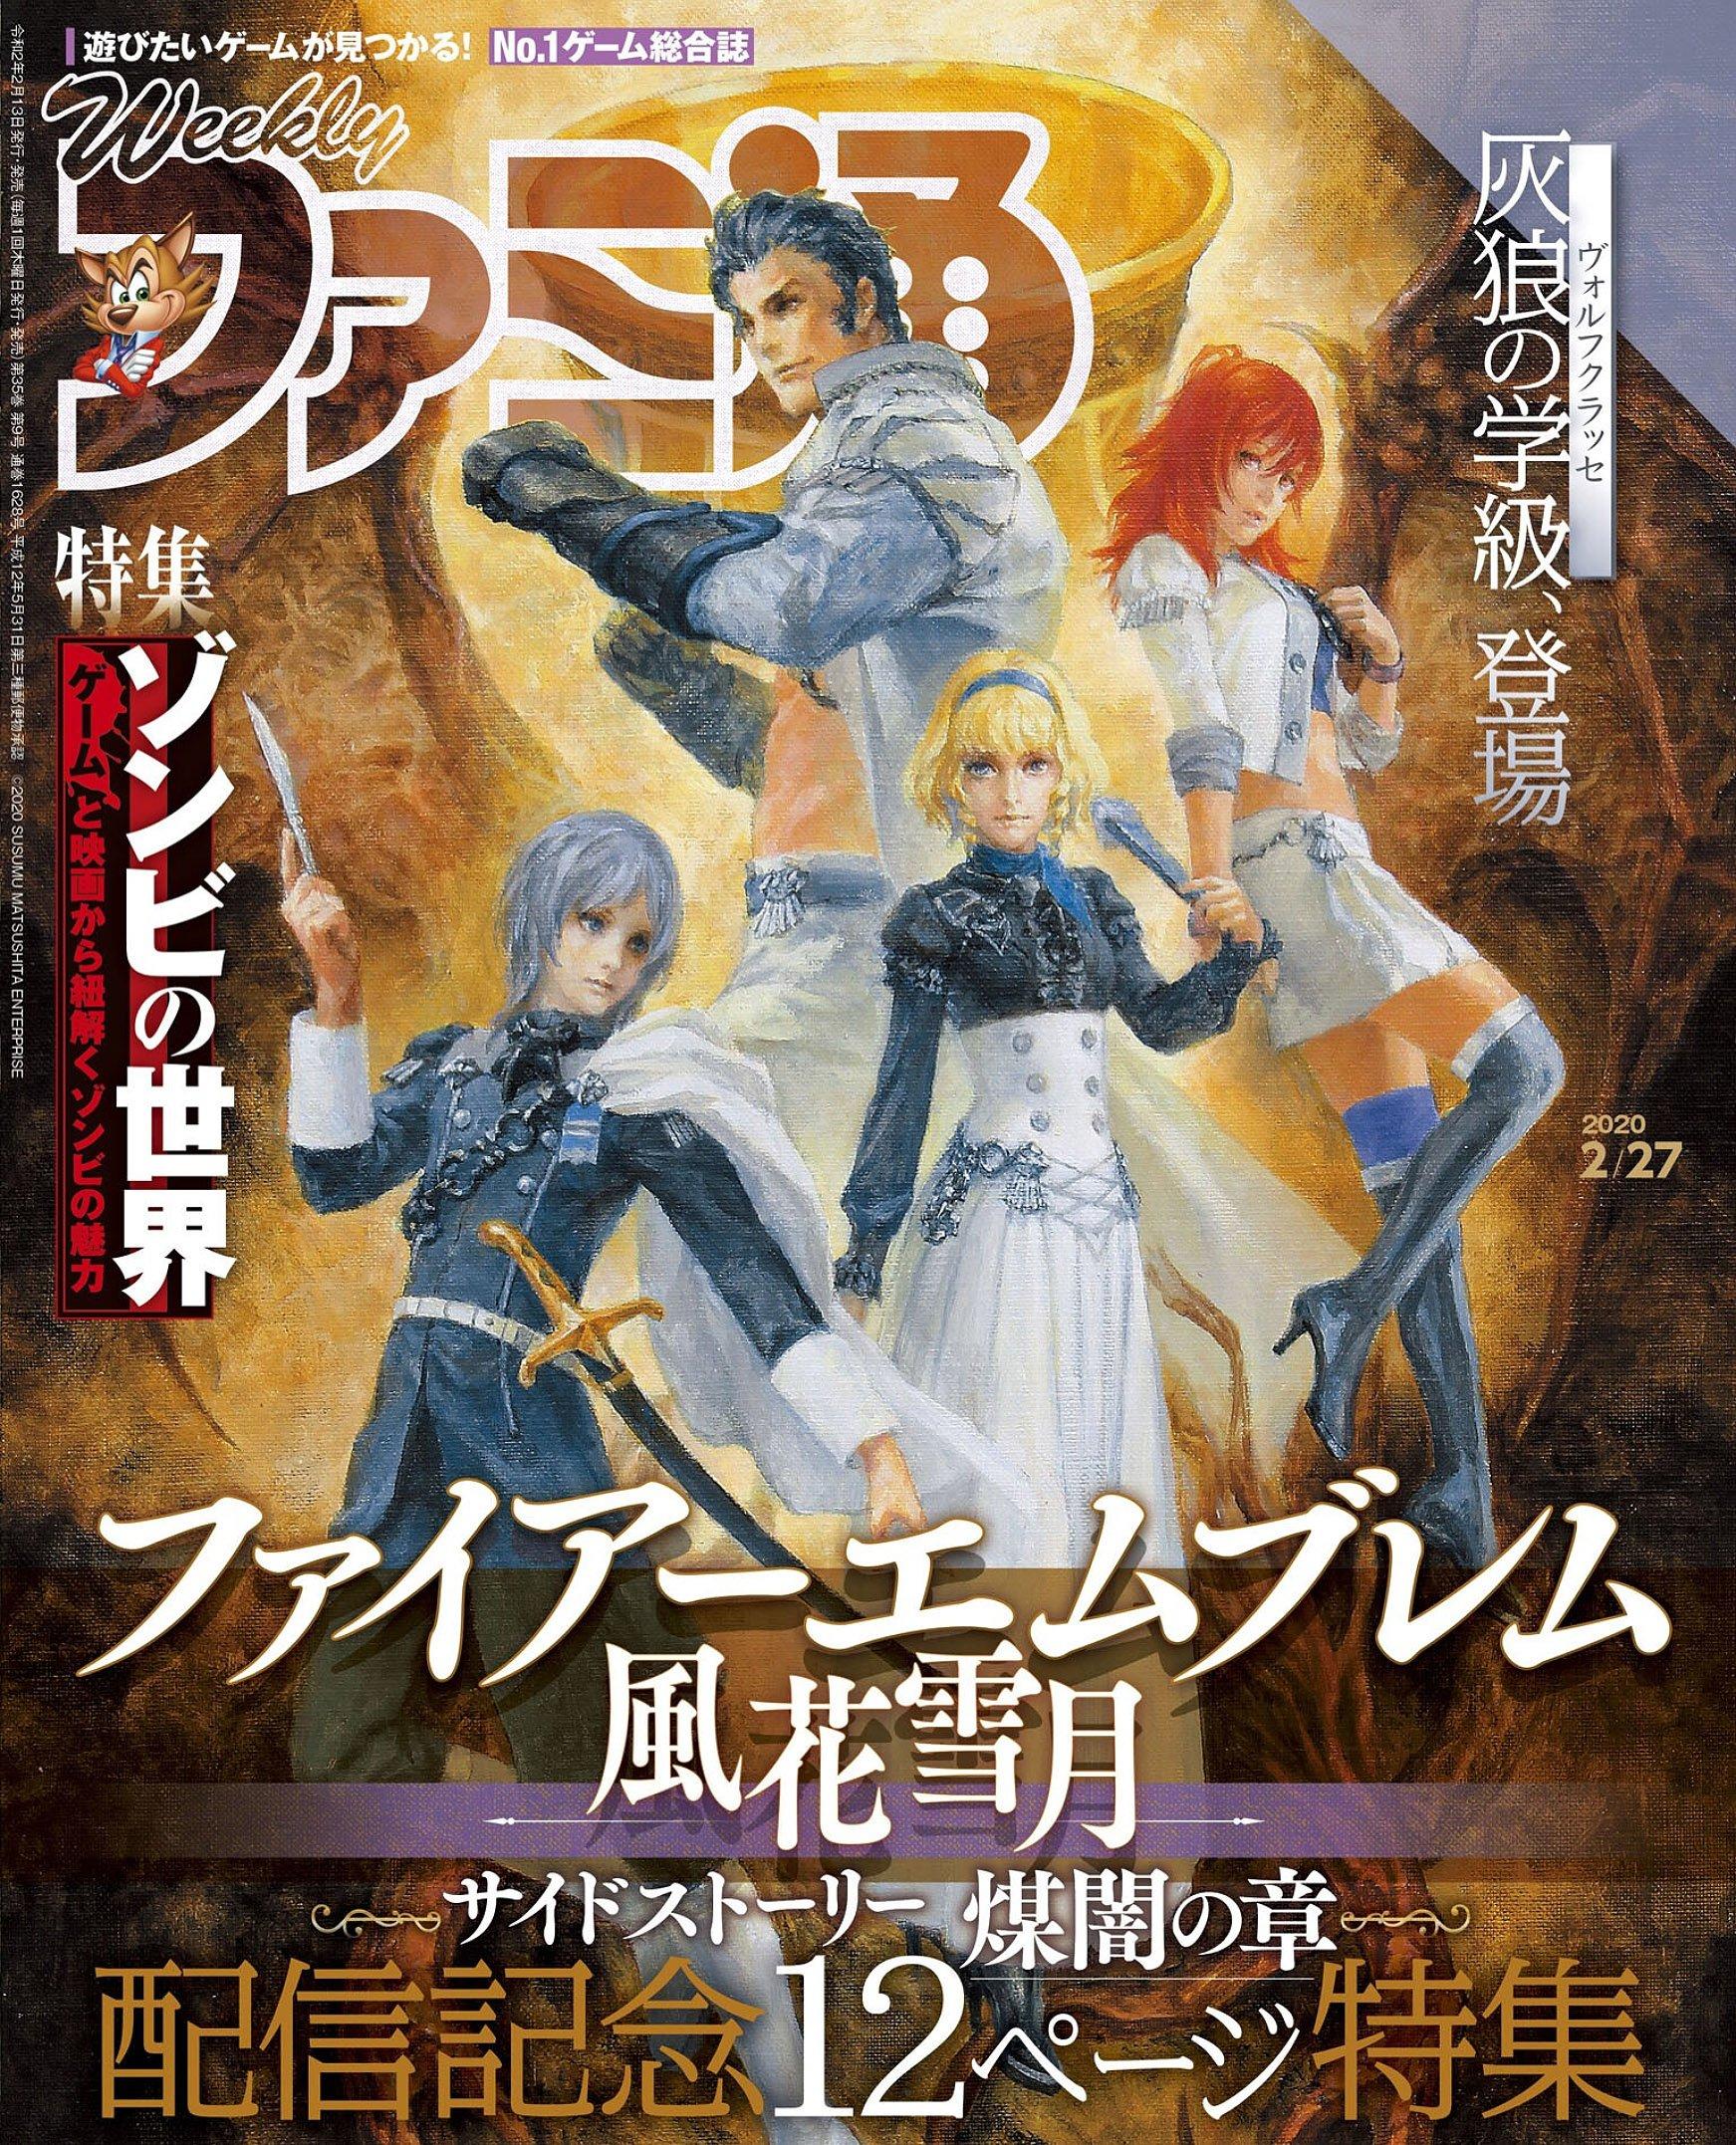 Famitsu 1628 (February 27, 2020)